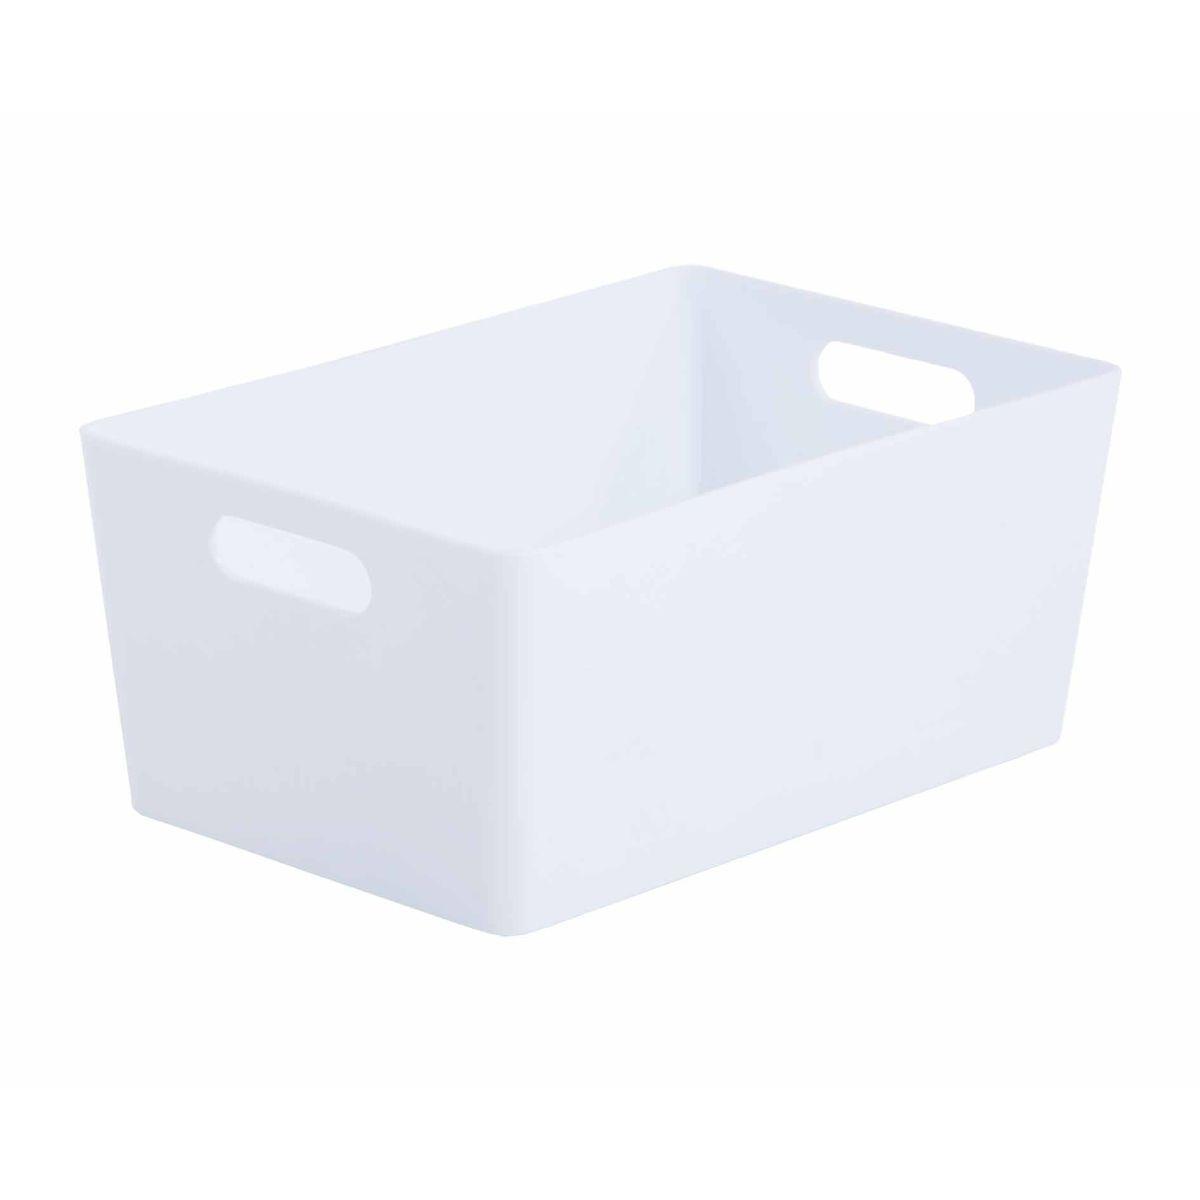 Wham Studio Basket 4.02 Pack of 12 White